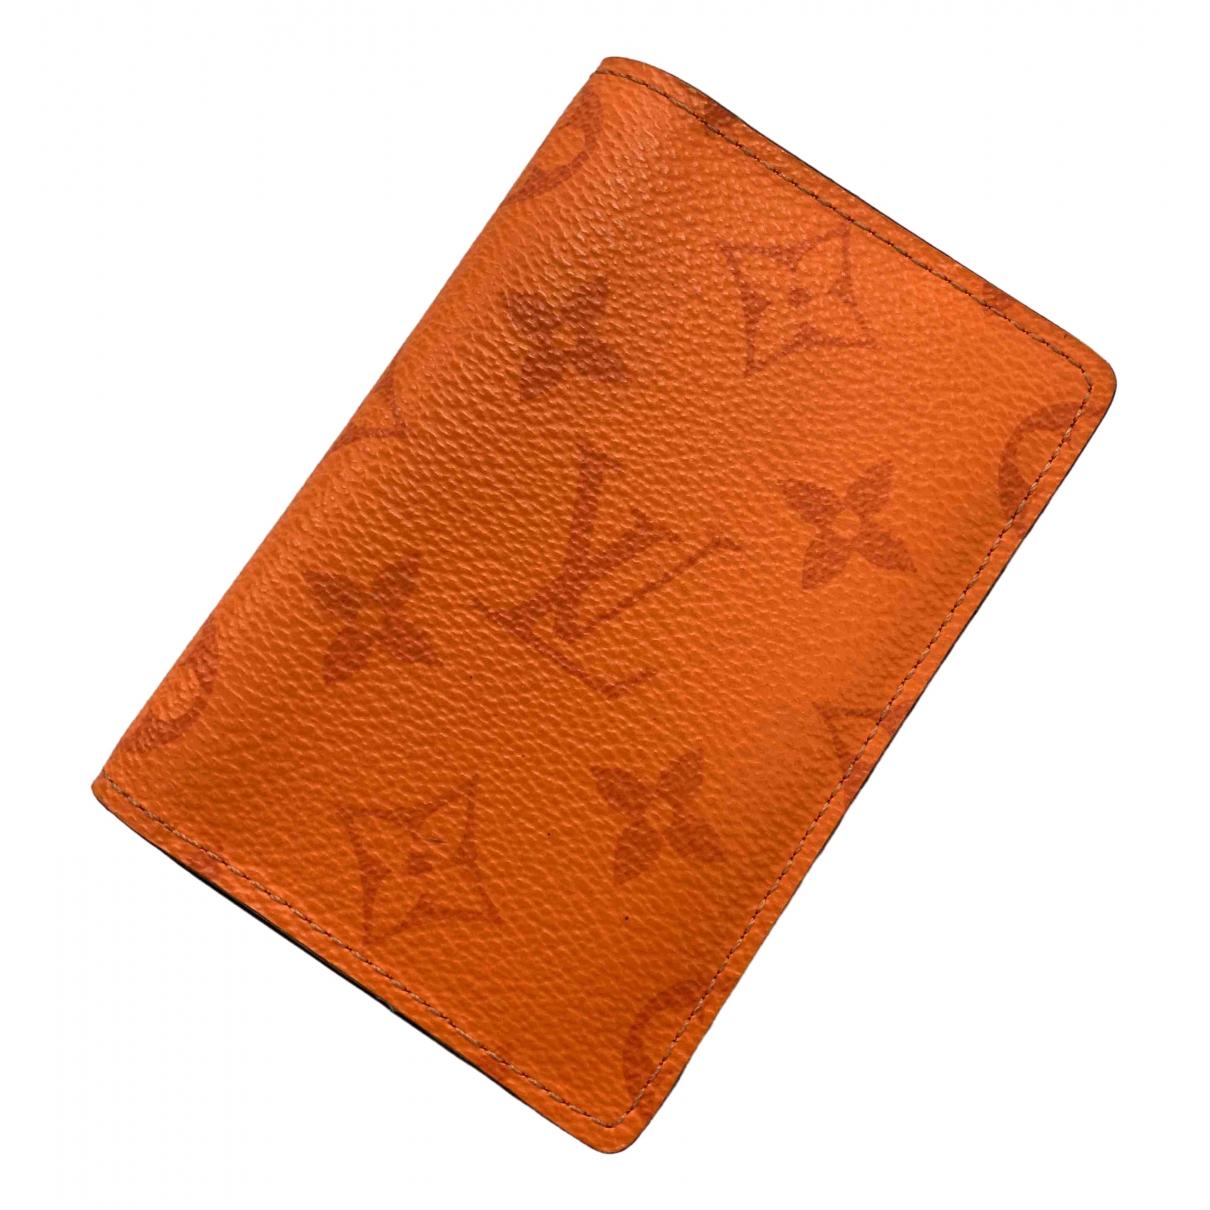 Louis Vuitton Pocket Organizer Orange Leather Small bag, wallet & cases for Men \N